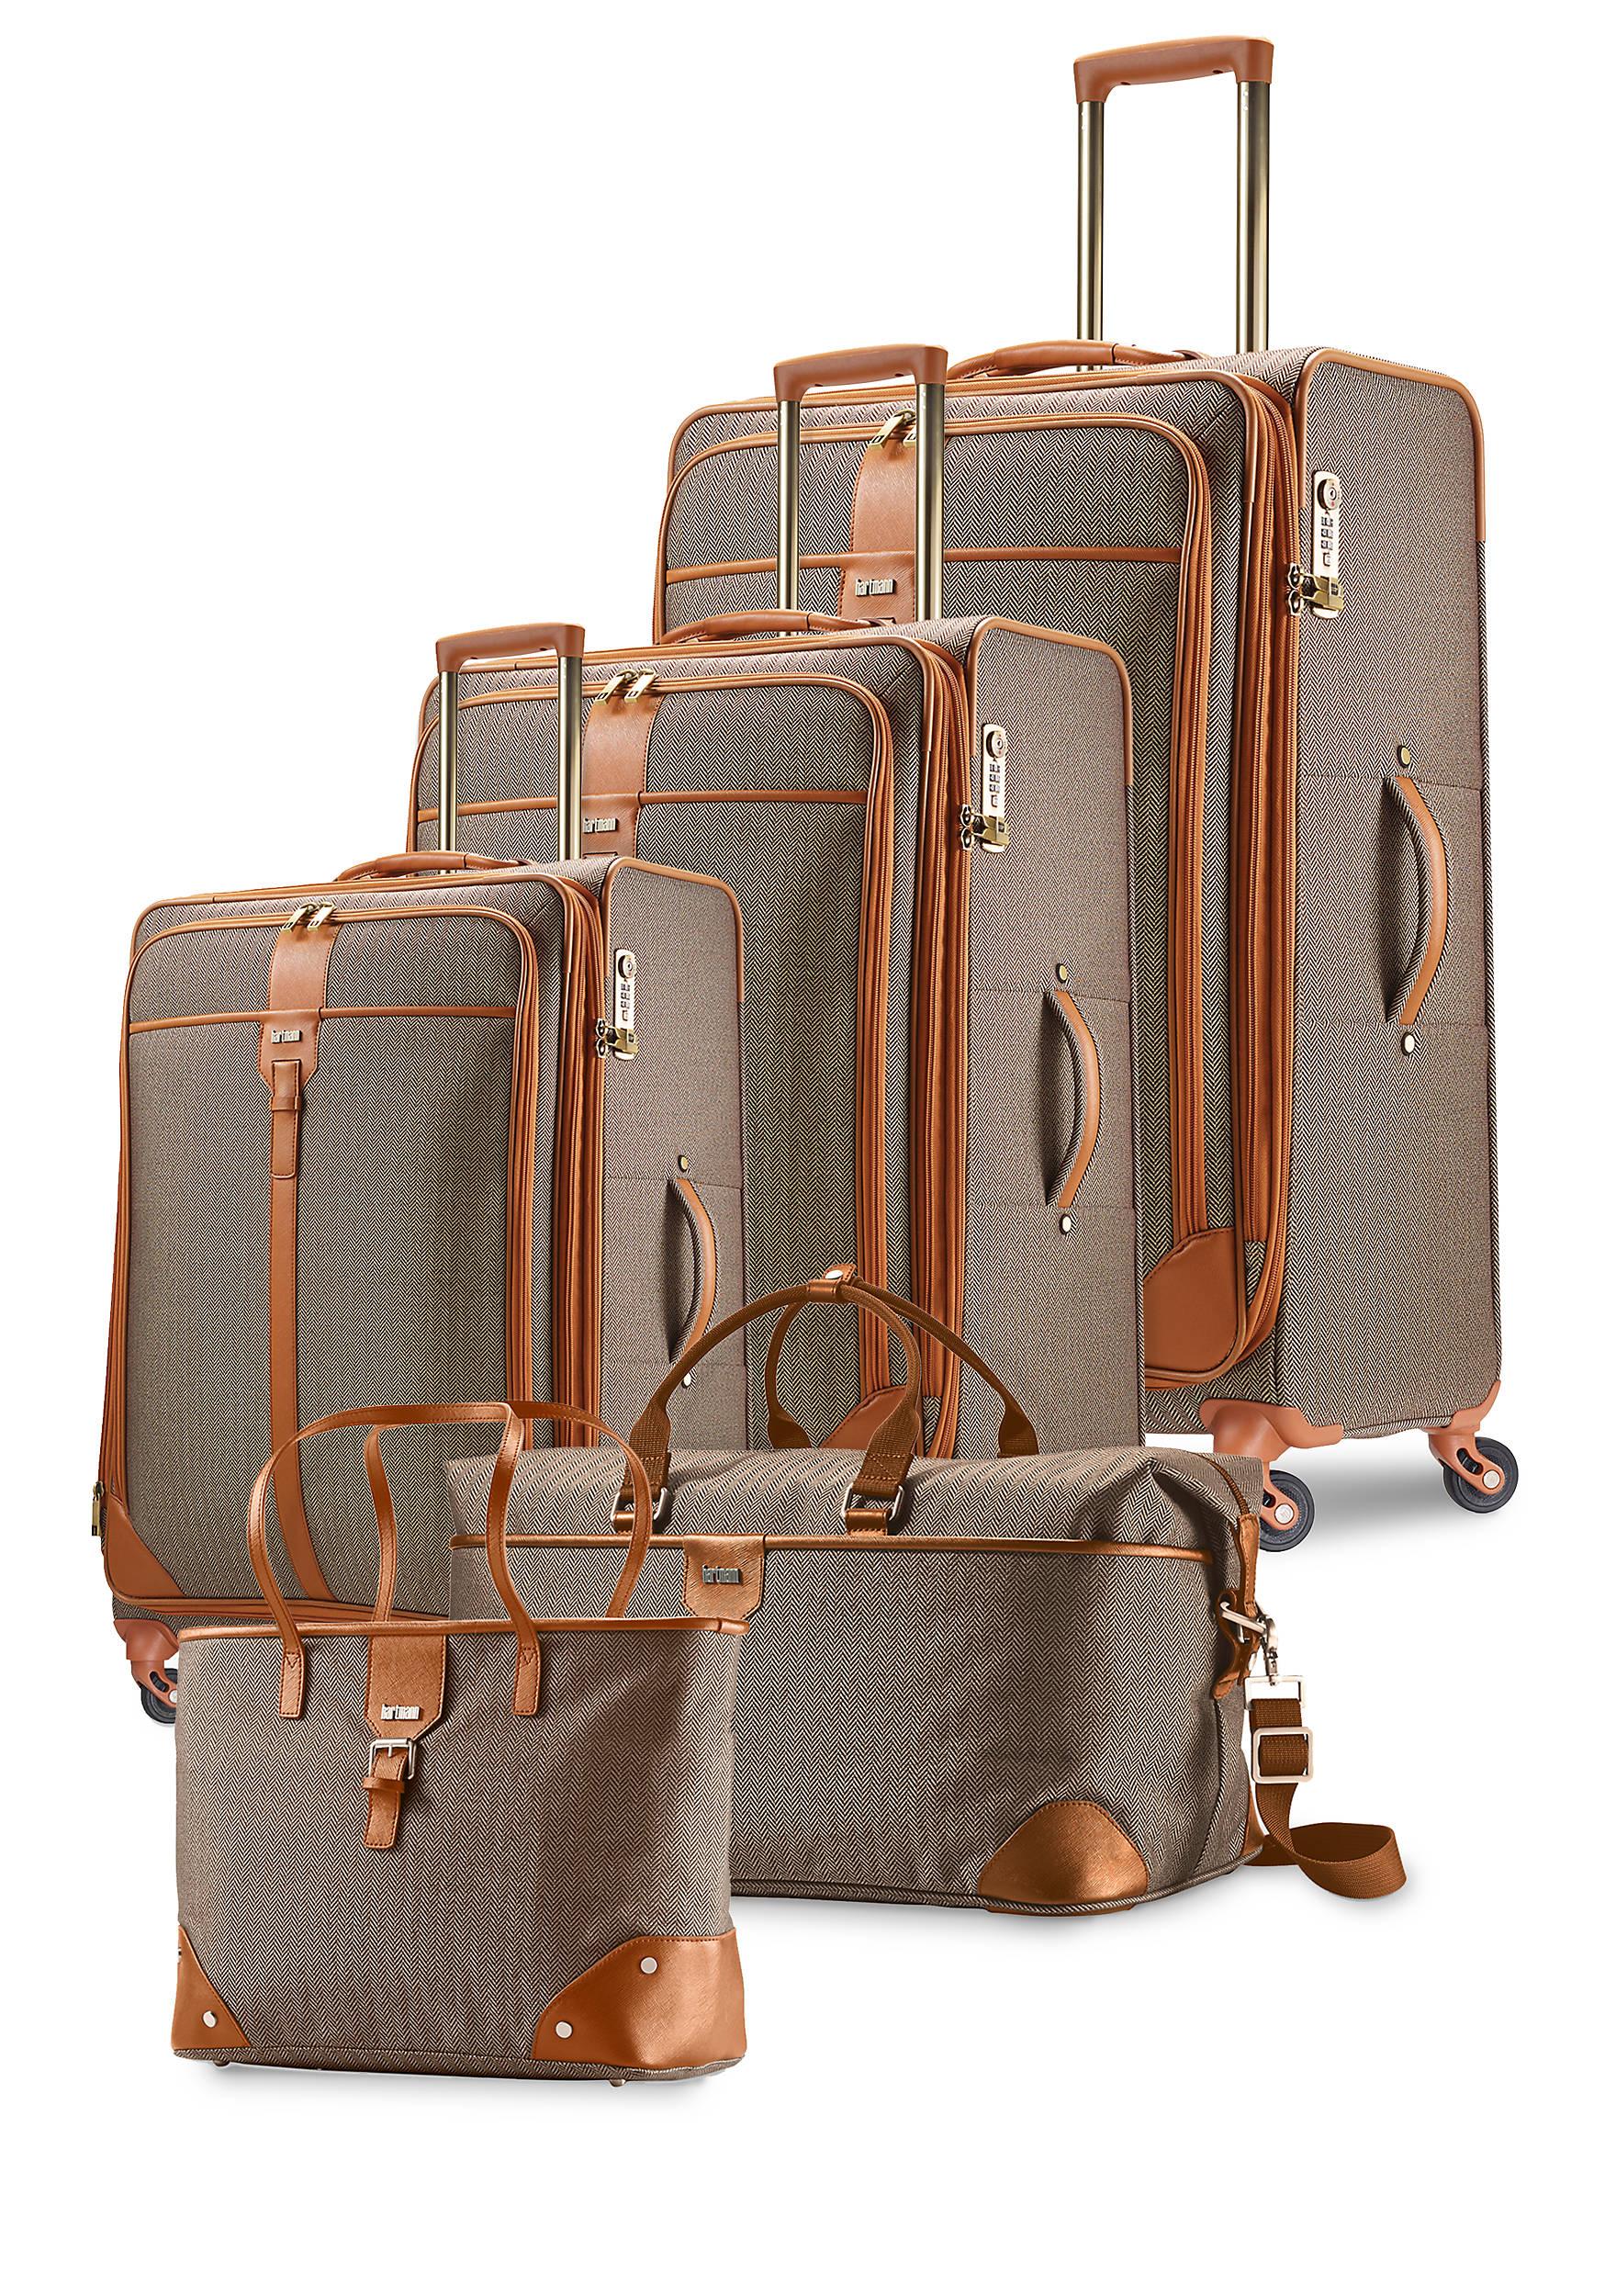 Hartmann Herringbone Luxe Luggage Collection Terracotta